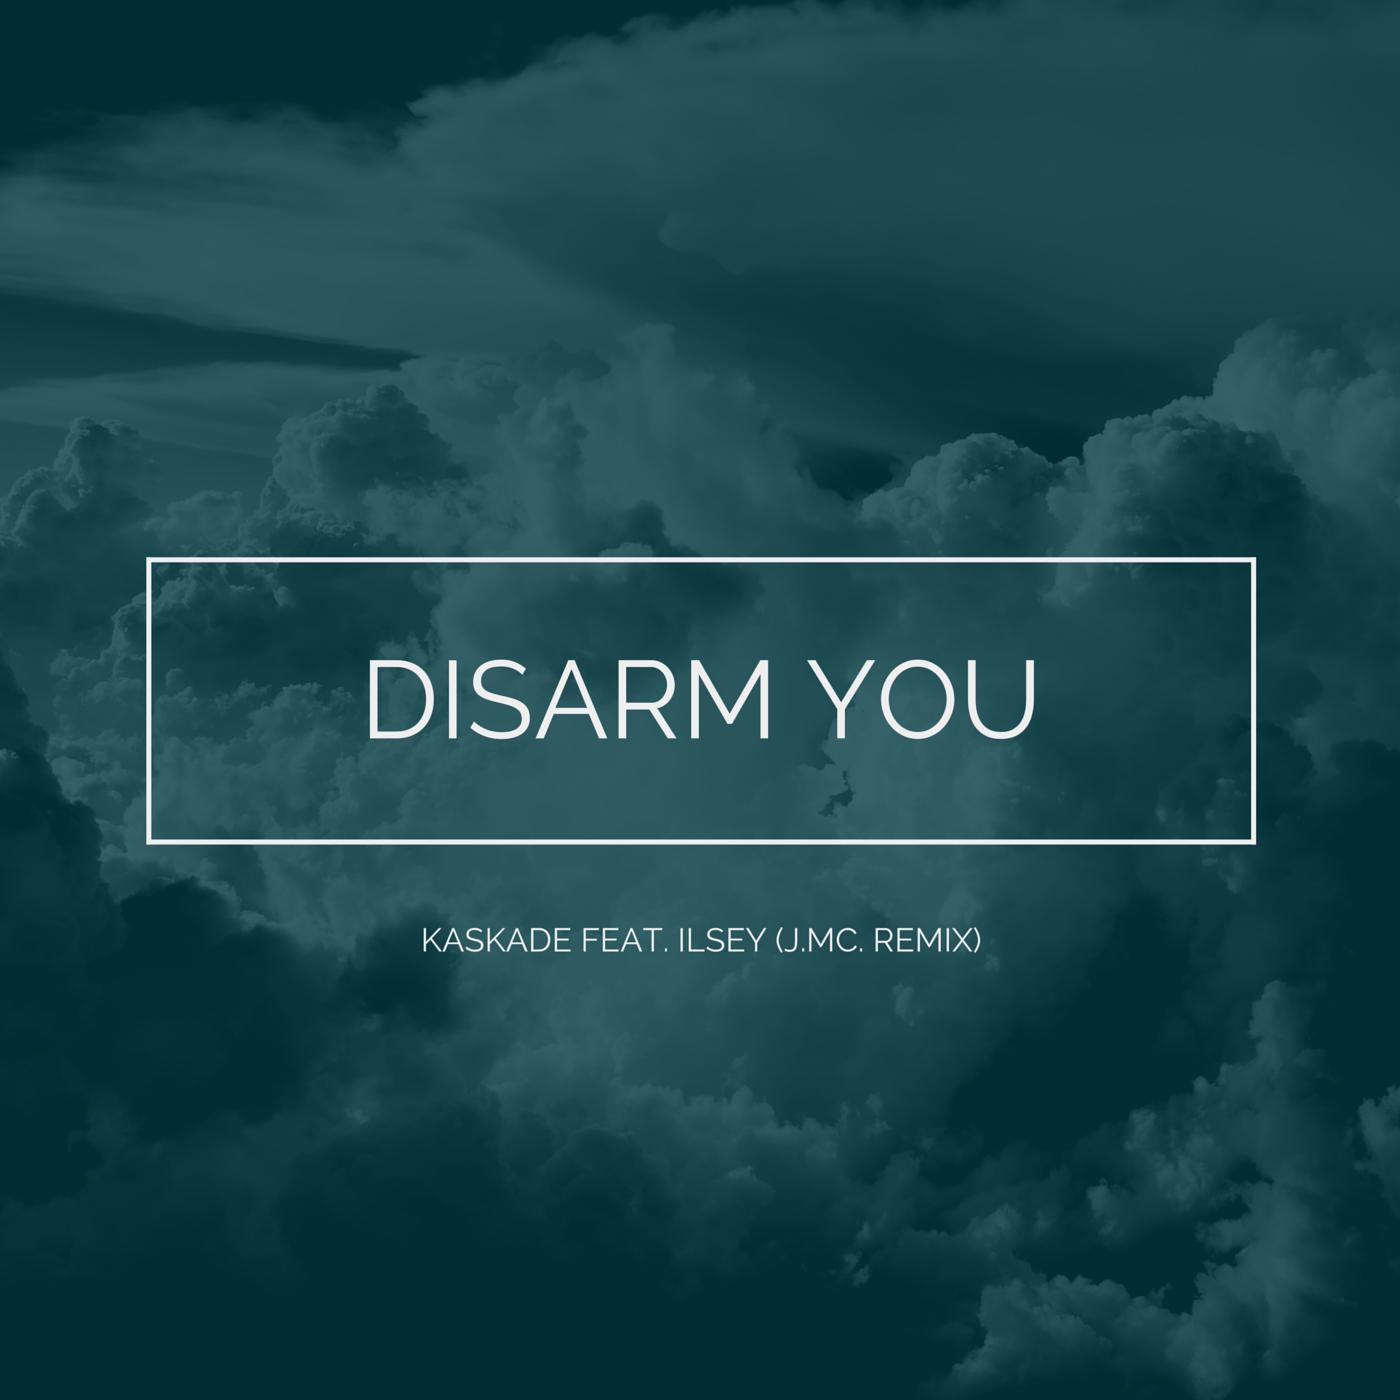 Disarm You Remix by JMC